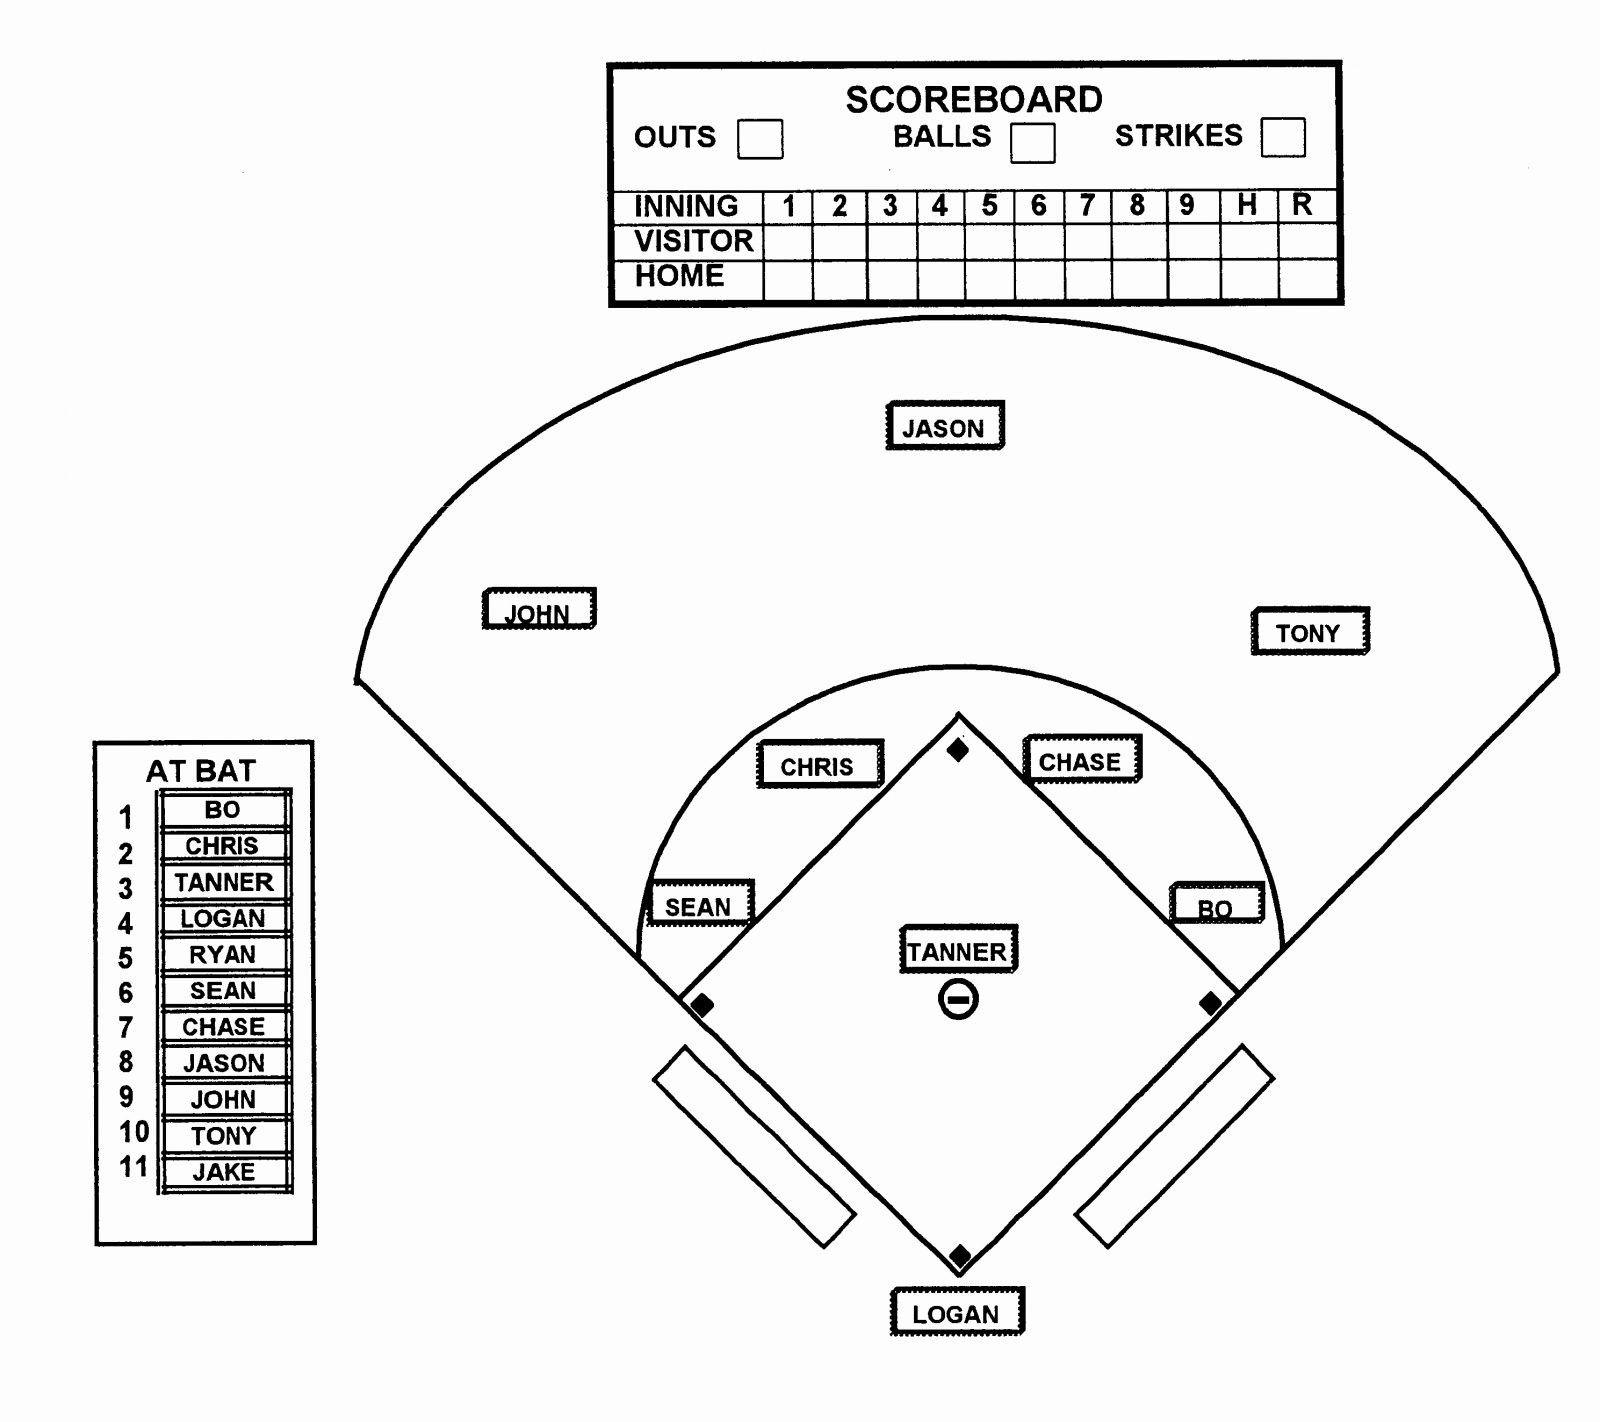 New Youth Baseball Lineup Template Exceltemplate Xls Xlstemplate Xlsformat Excelformat Microsoftexce Baseball Lineup Templates Printable Free Depth Chart